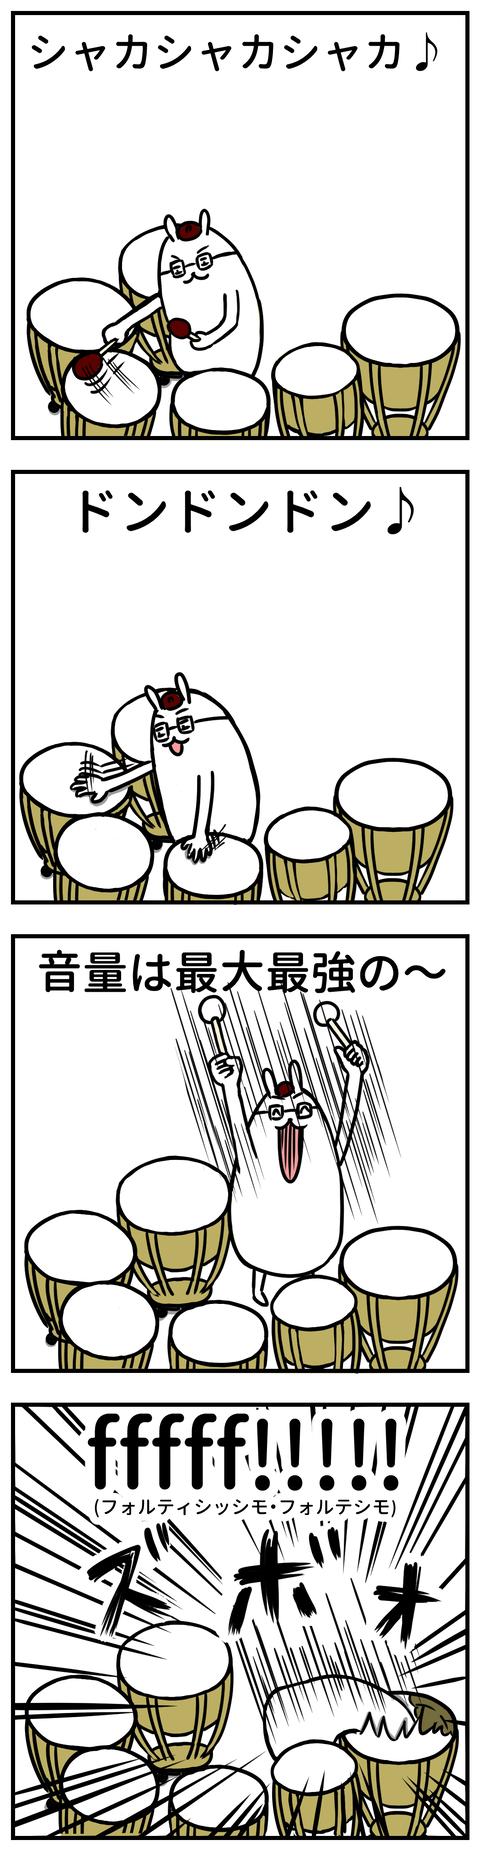 manga-yuzuporo92-1